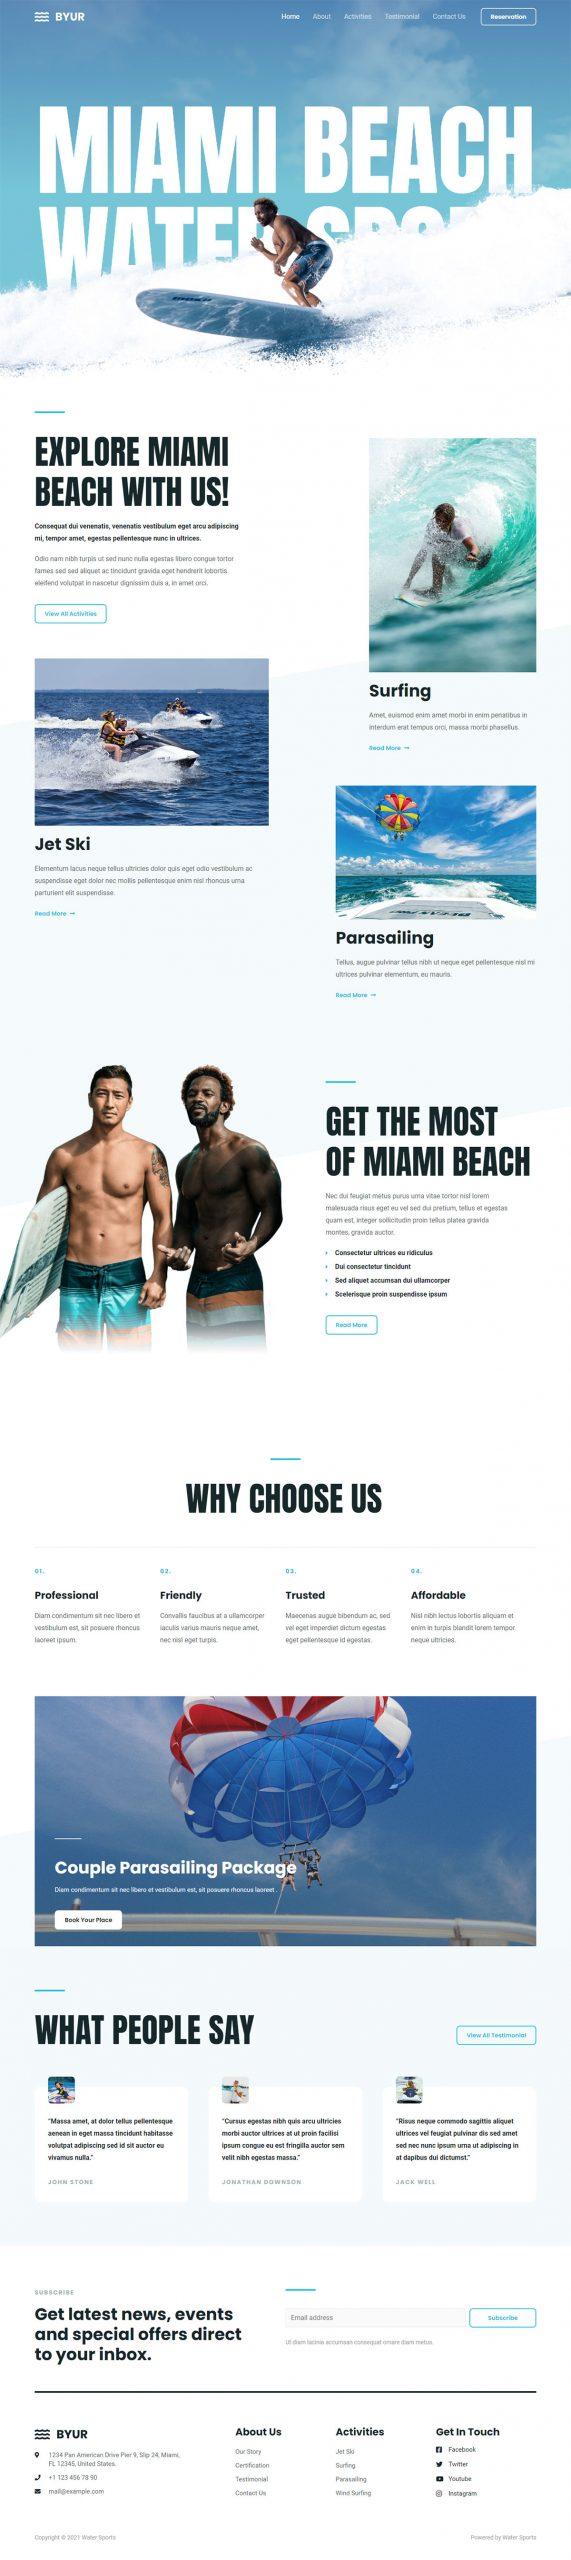 Adamo Web Design | Web Design Durham | water sports 04 scaled